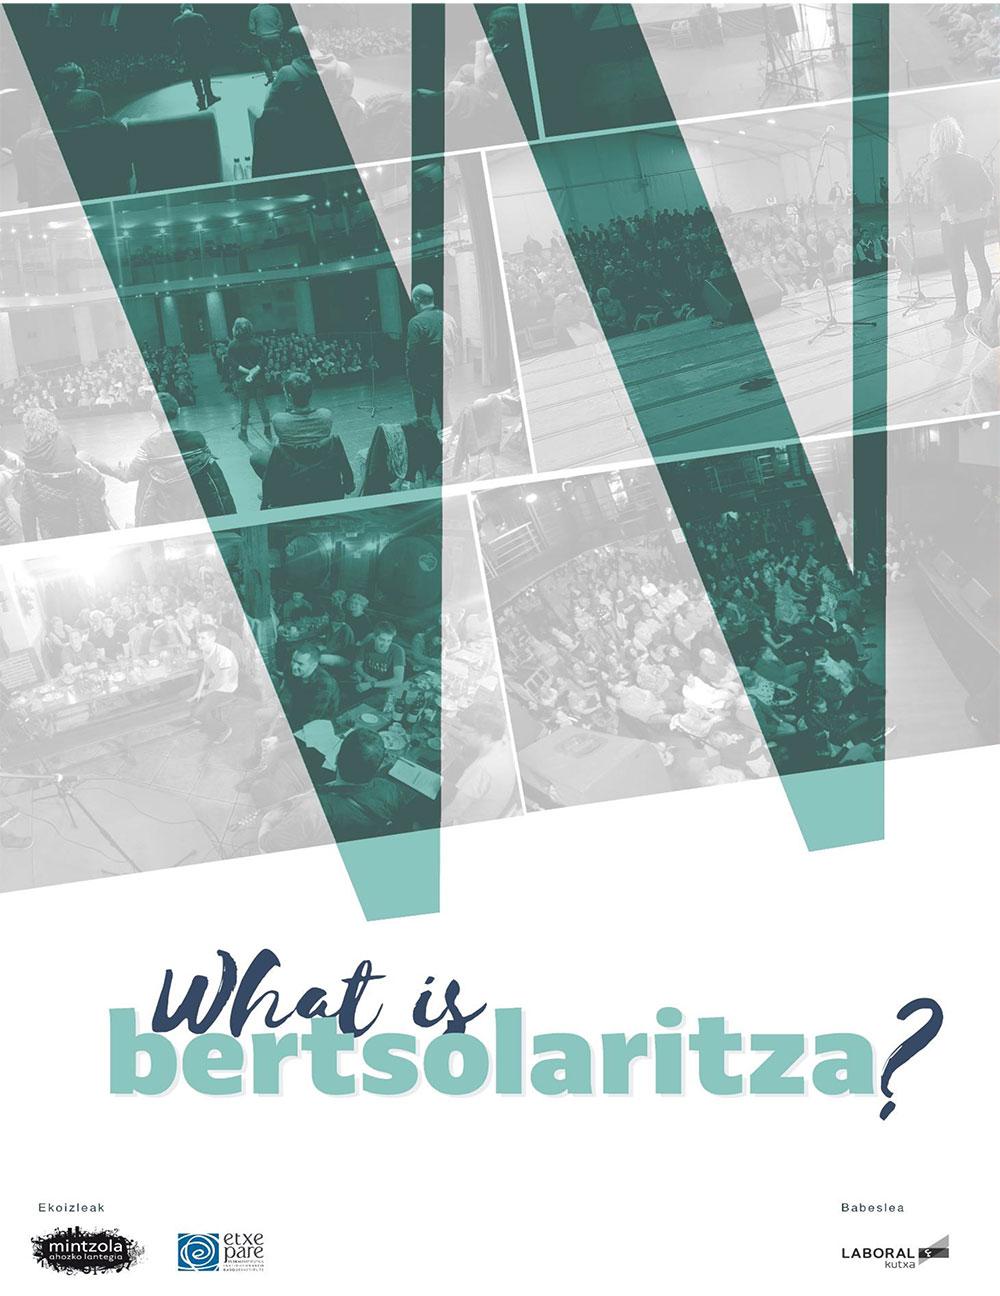 What is Bertsolaritza?